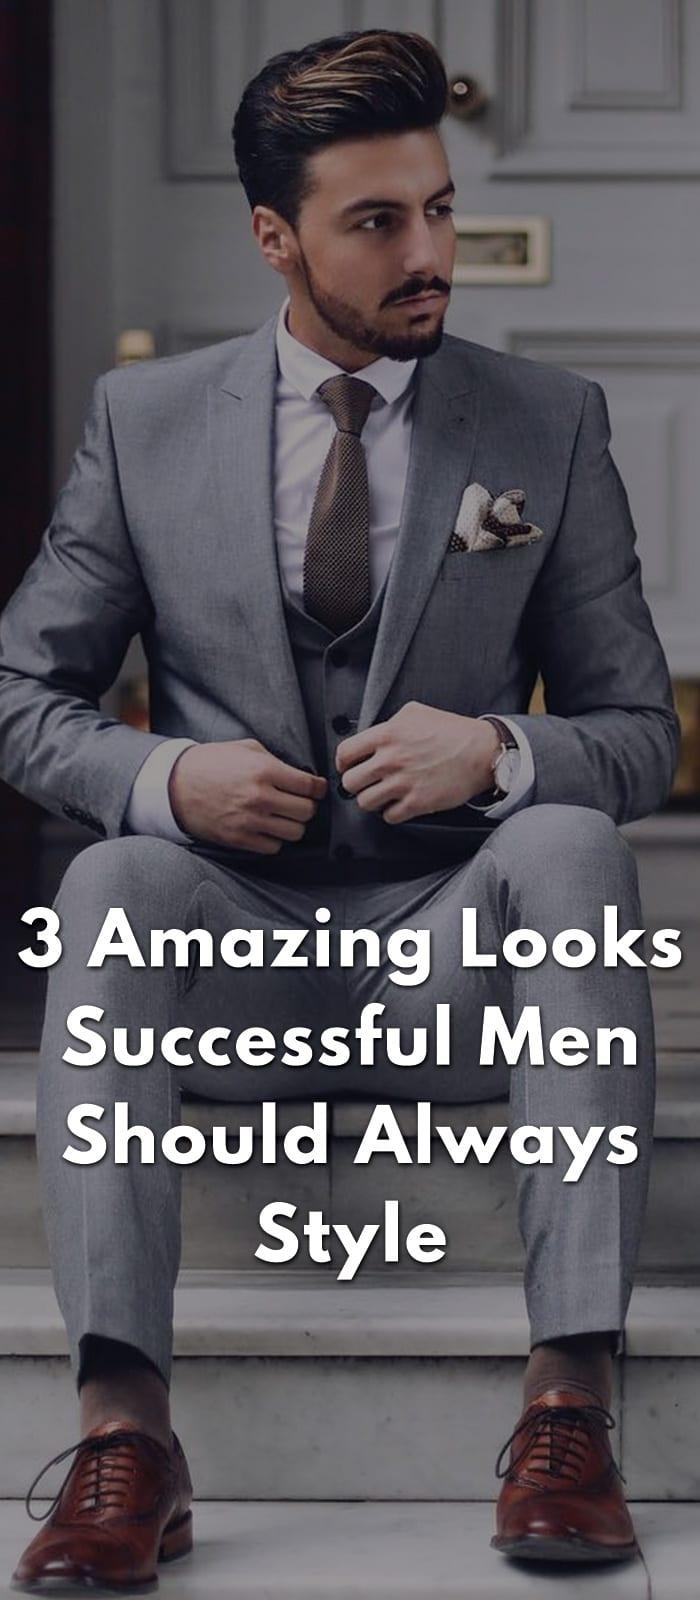 3 Amazing Looks Successful Men Should Always Style